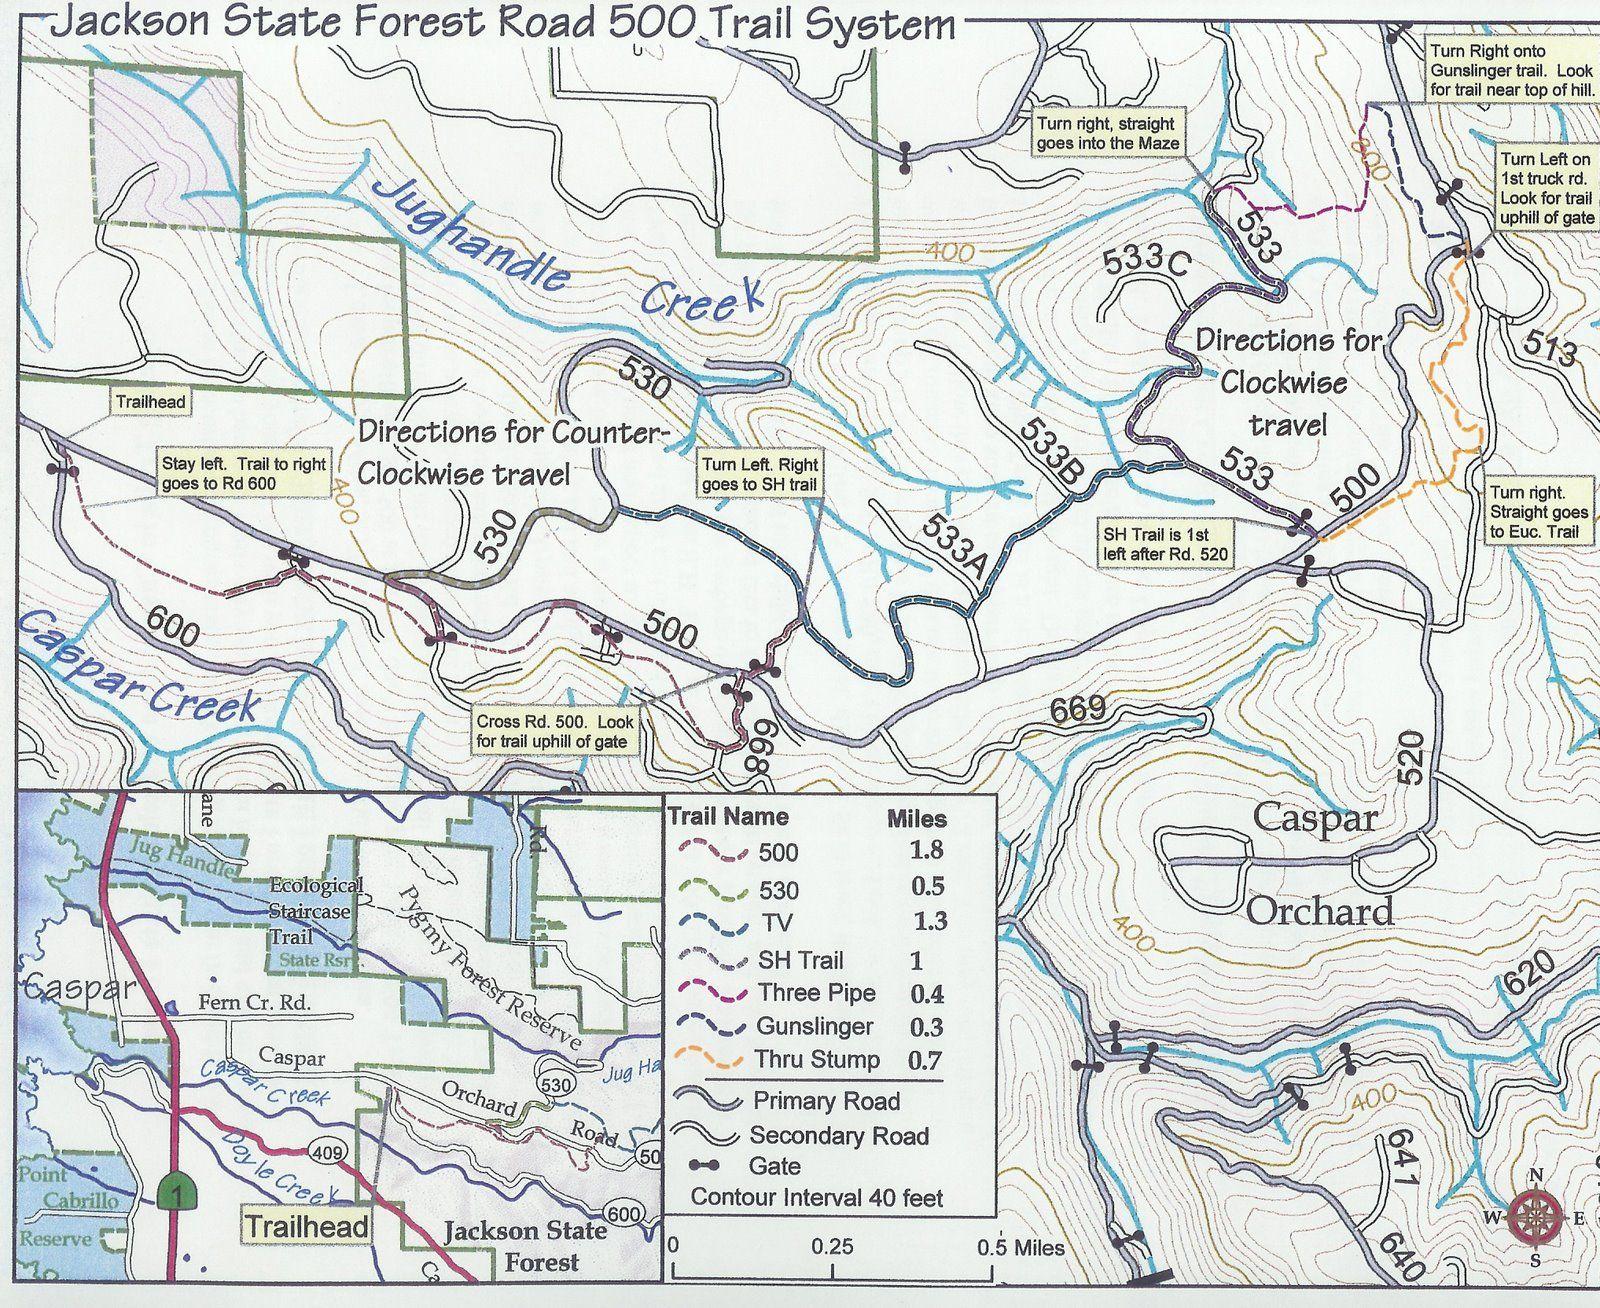 Unofficial Trails Near Caspar Orchard Road Rd 500 Trail Trail Maps Mtb Trails